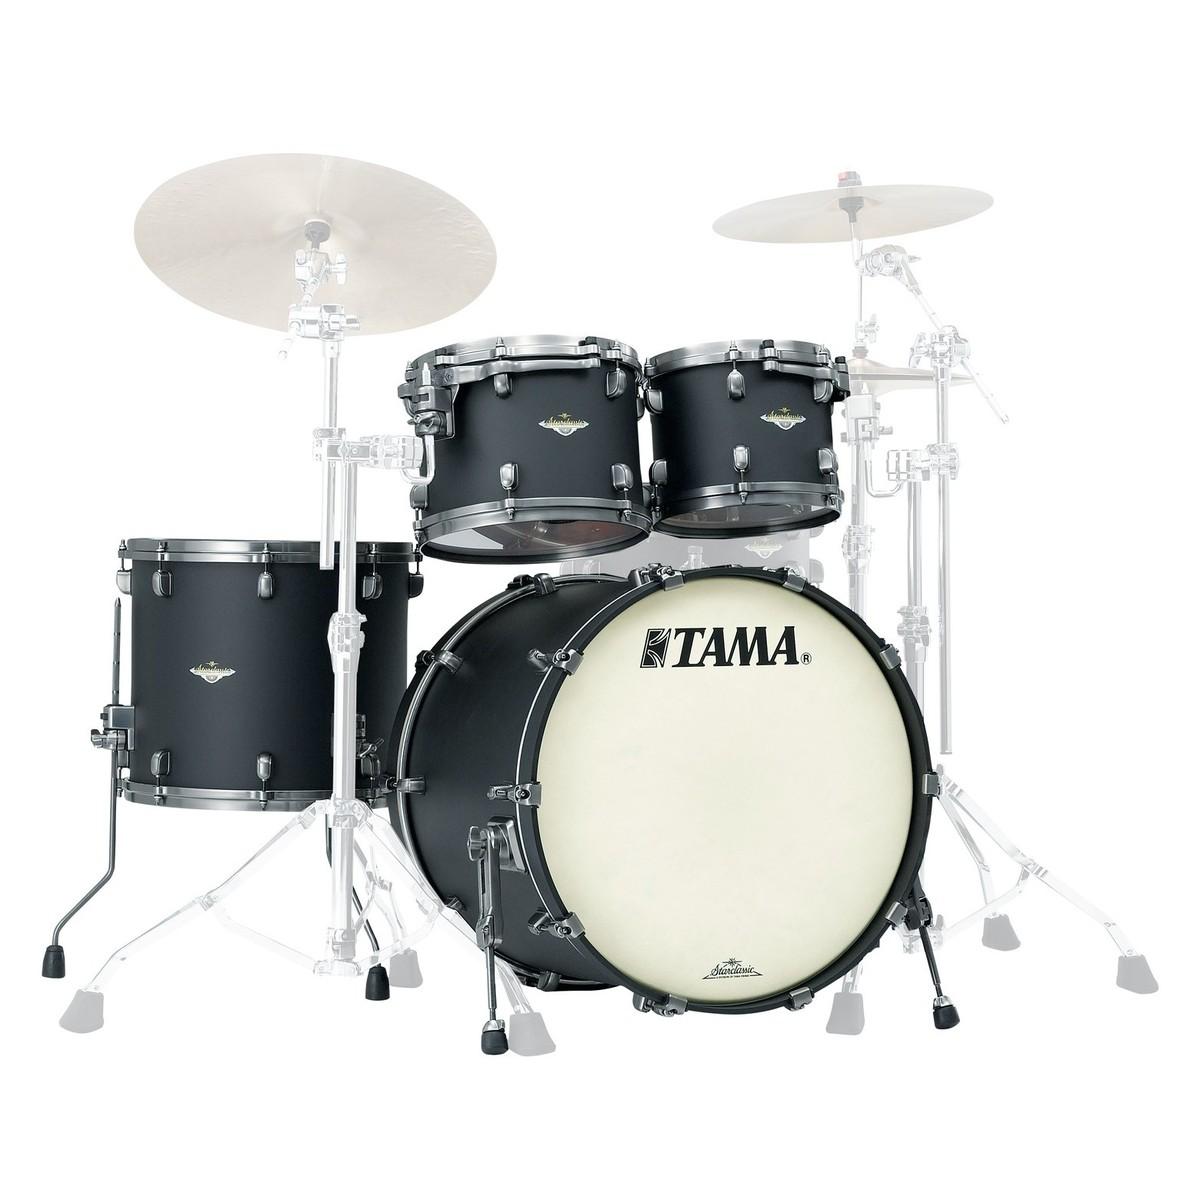 tama starclassic bubinga 22 4pc shell pack flat black at gear4music. Black Bedroom Furniture Sets. Home Design Ideas